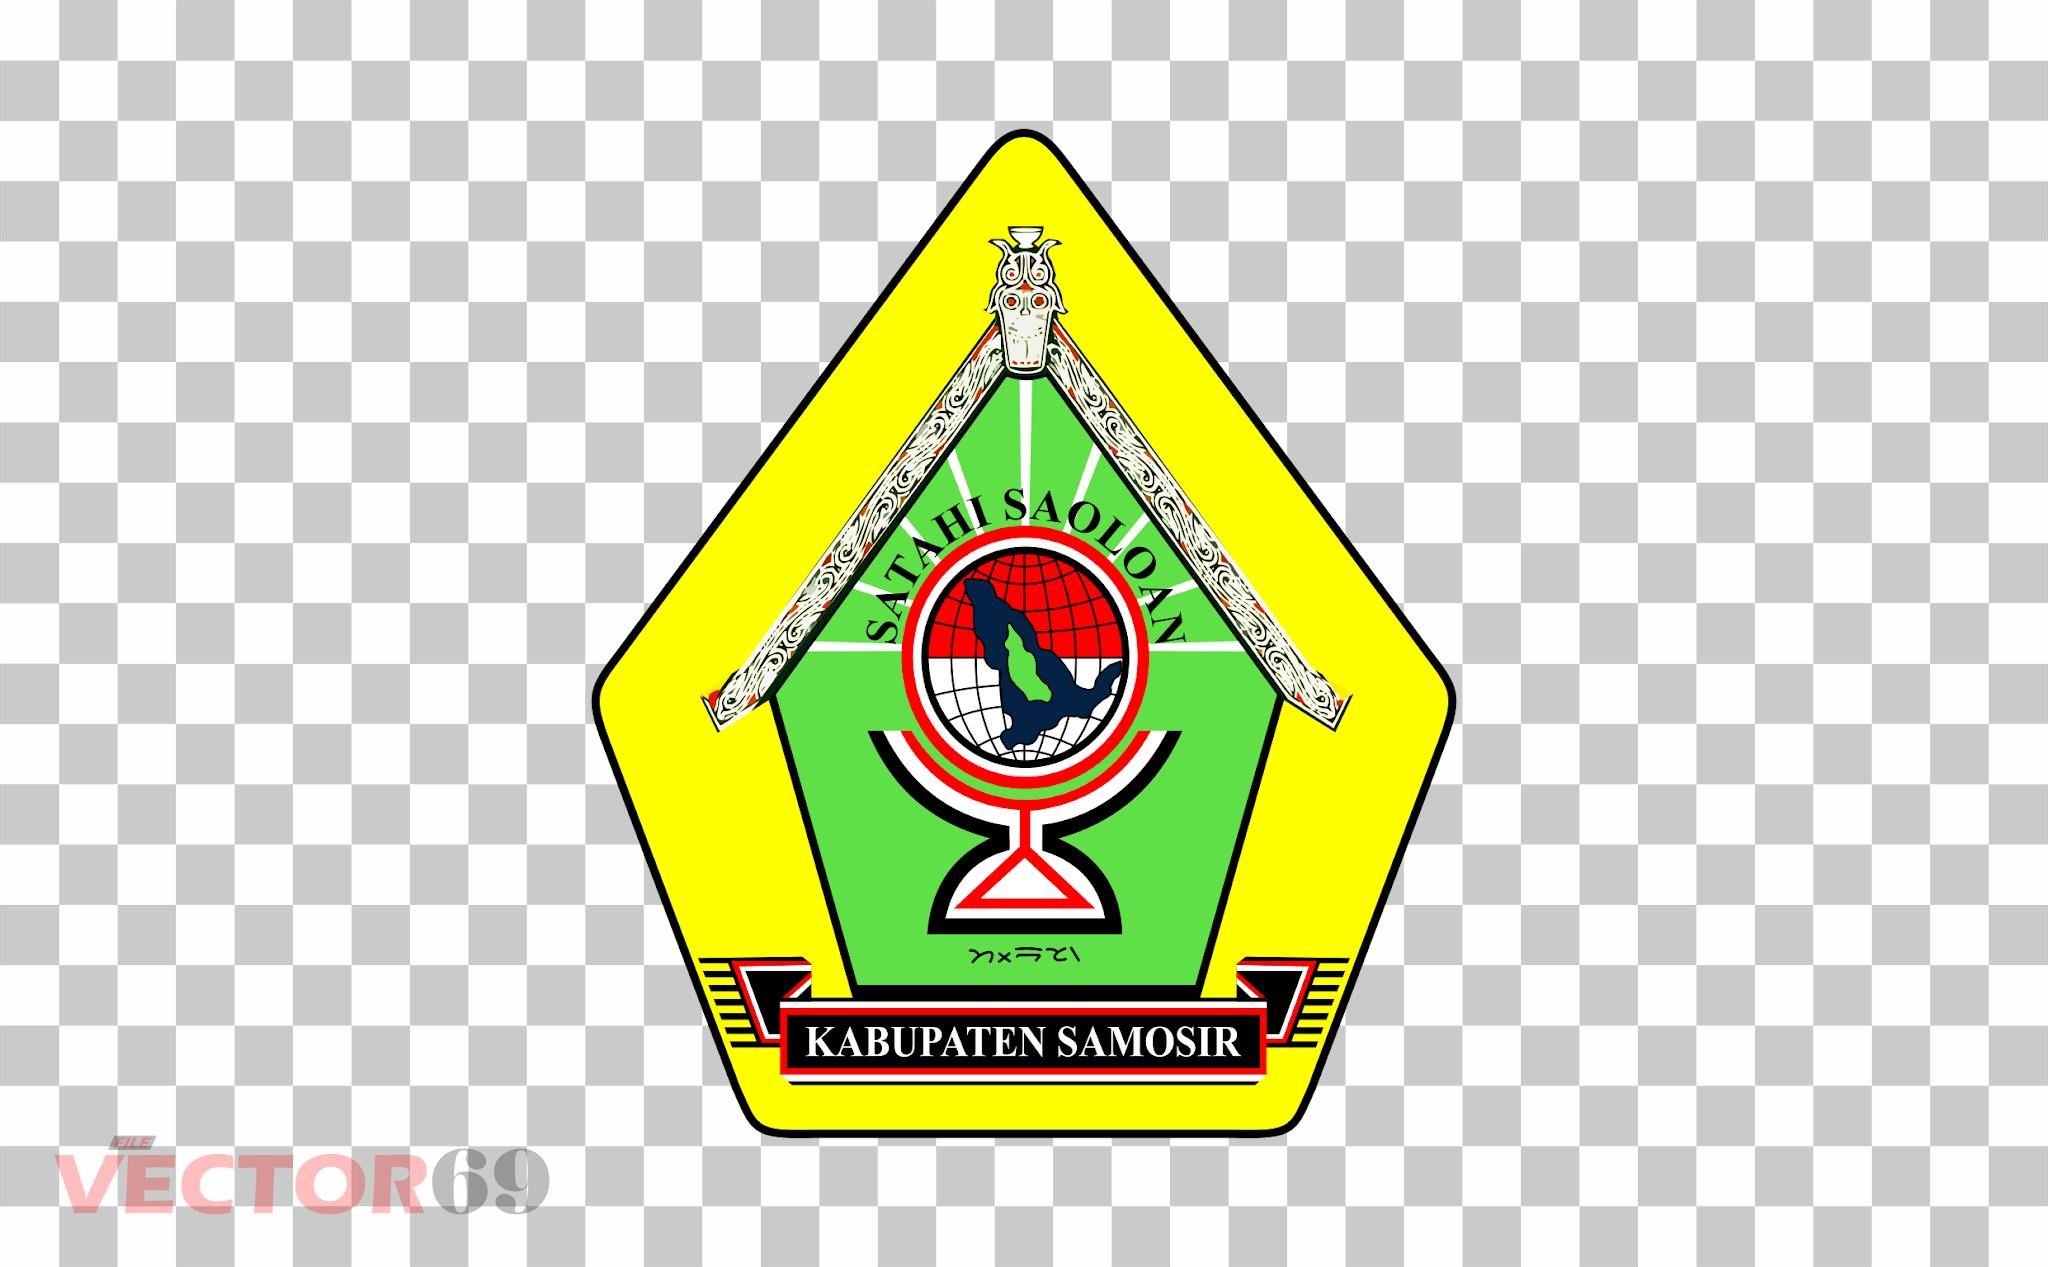 Kabupaten Samosir Logo - Download Vector File PNG (Portable Network Graphics)